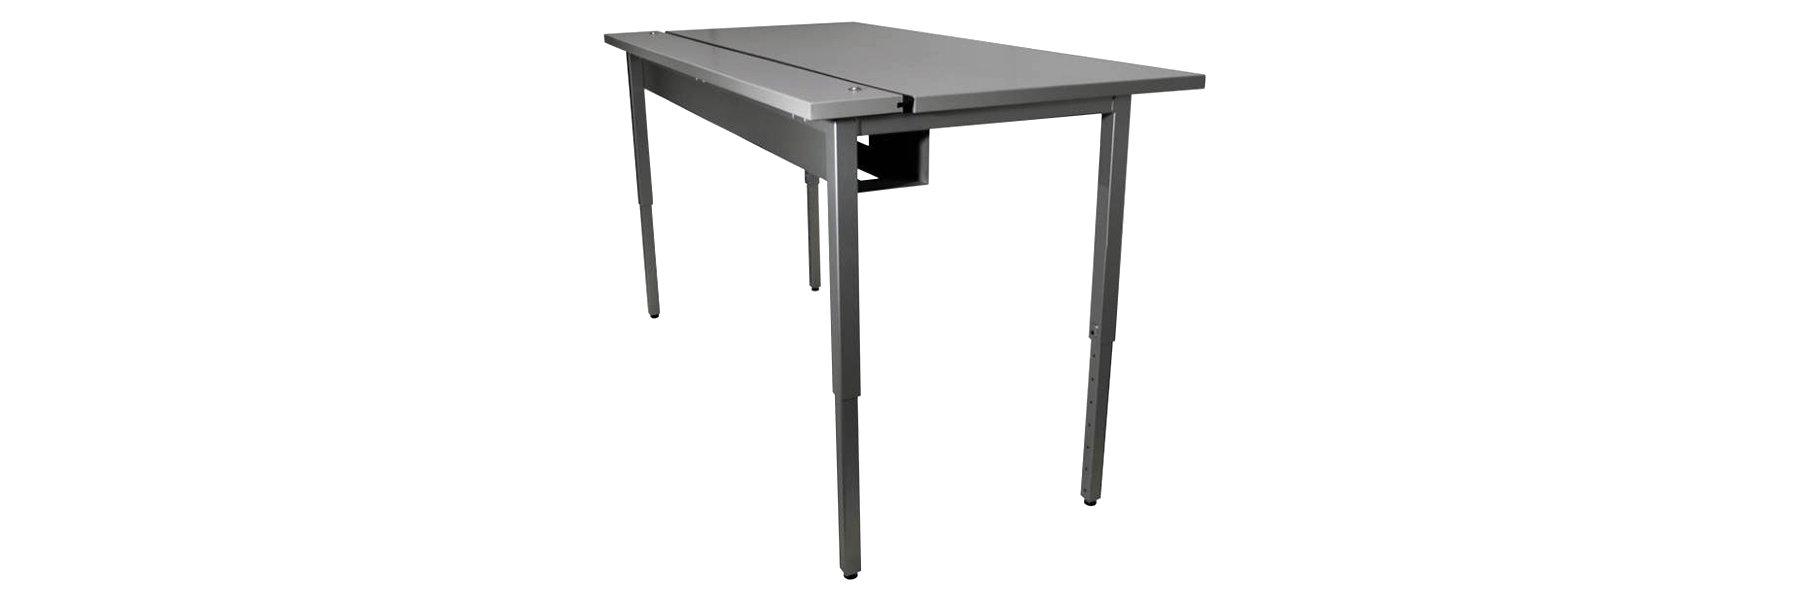 Corilam 9000T Steel Base Desk